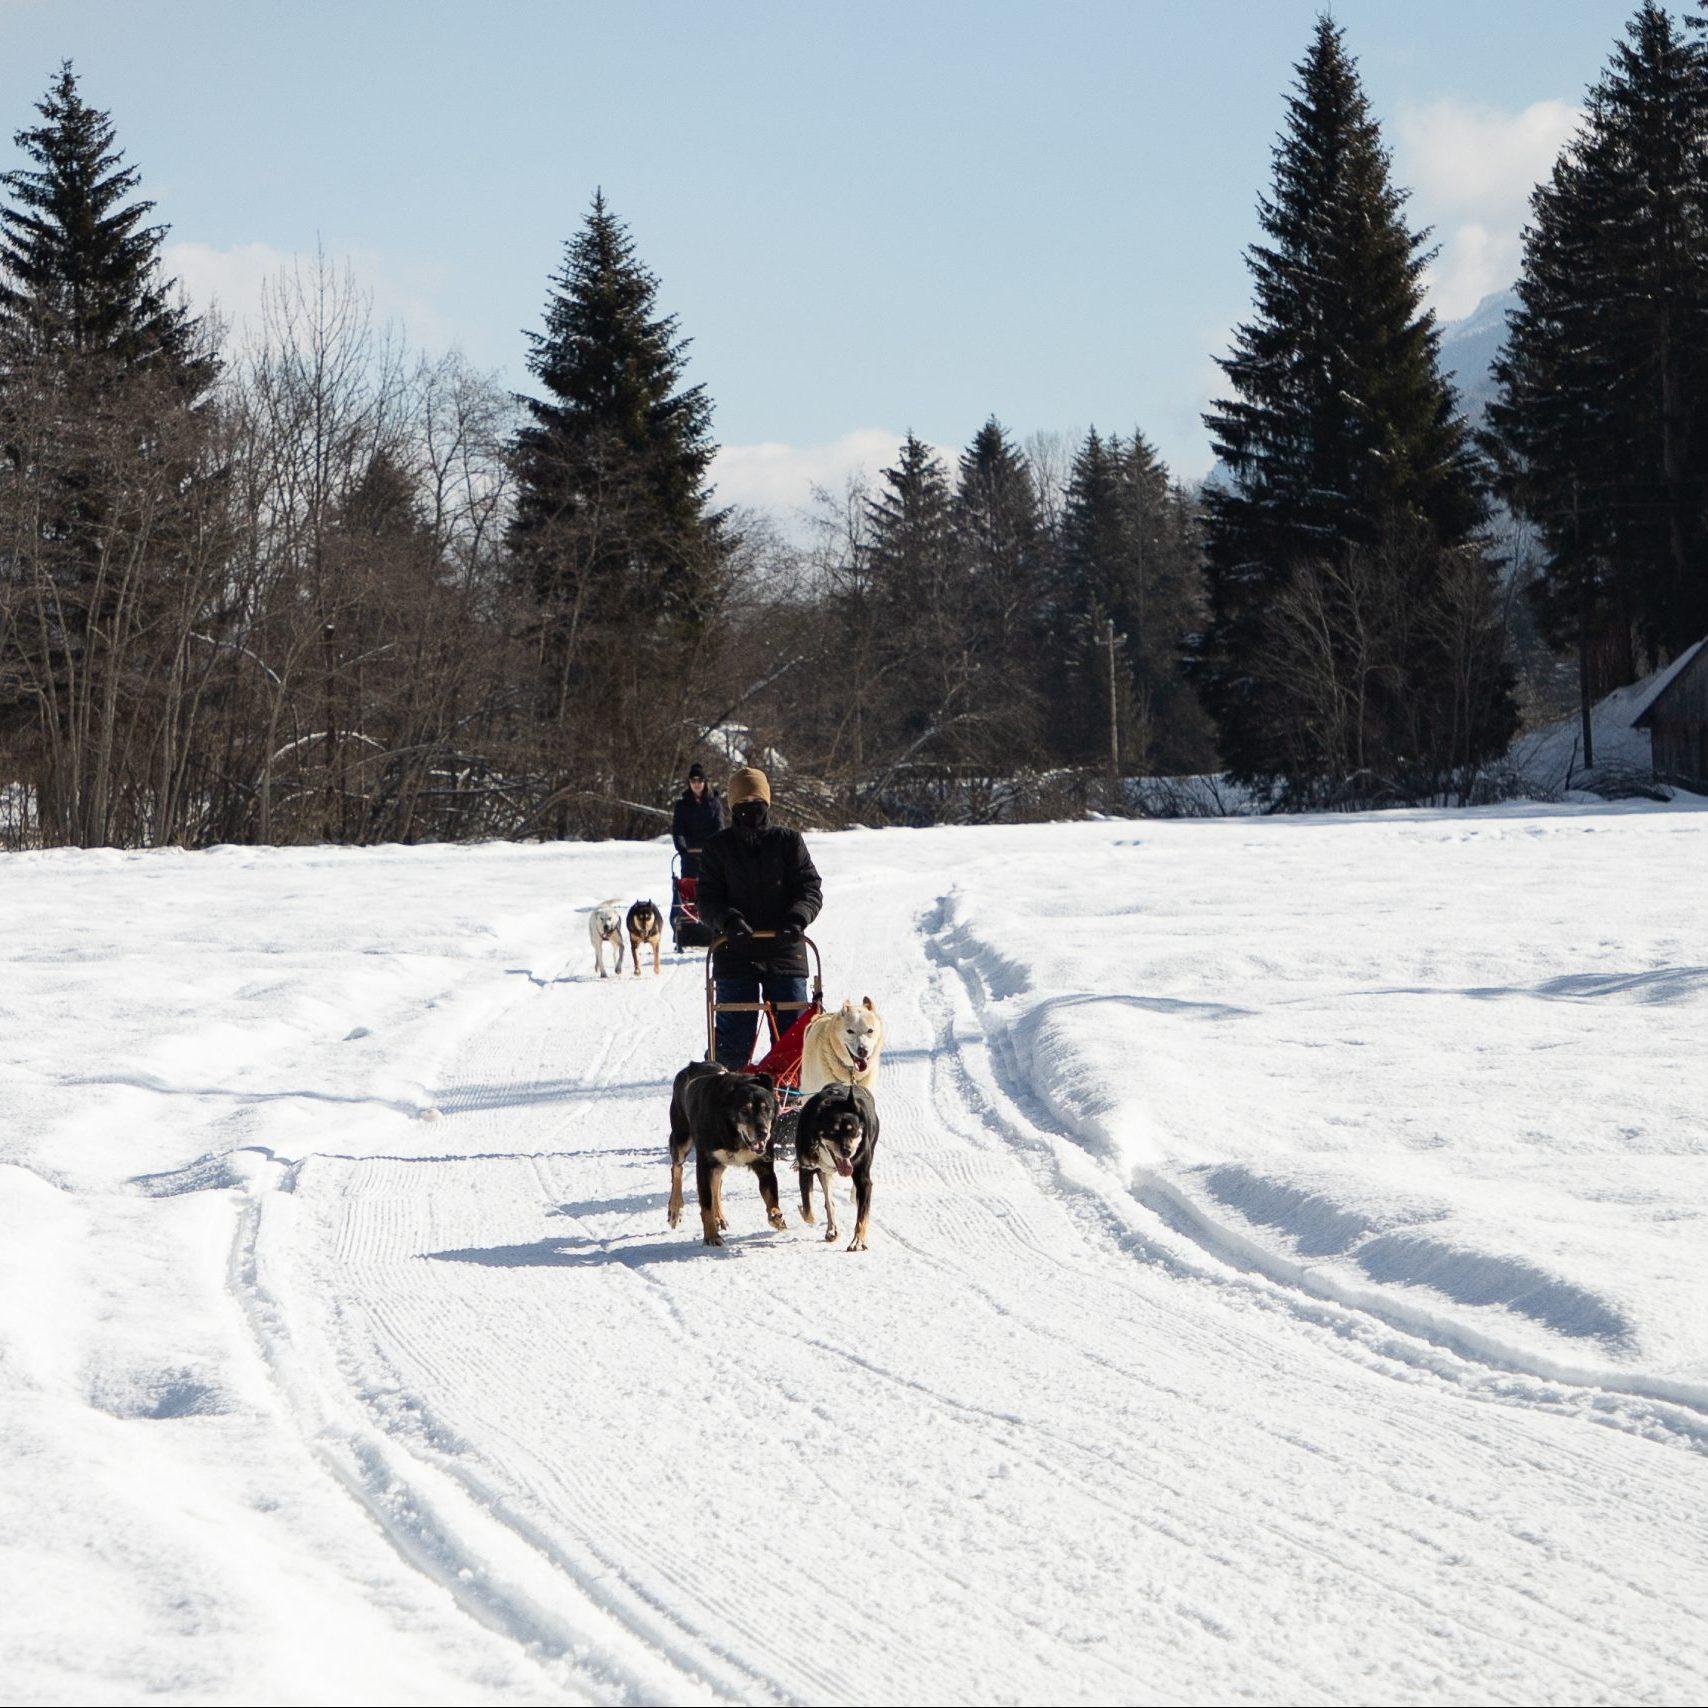 Tarvisio: beauty, snow, and dog sledding!